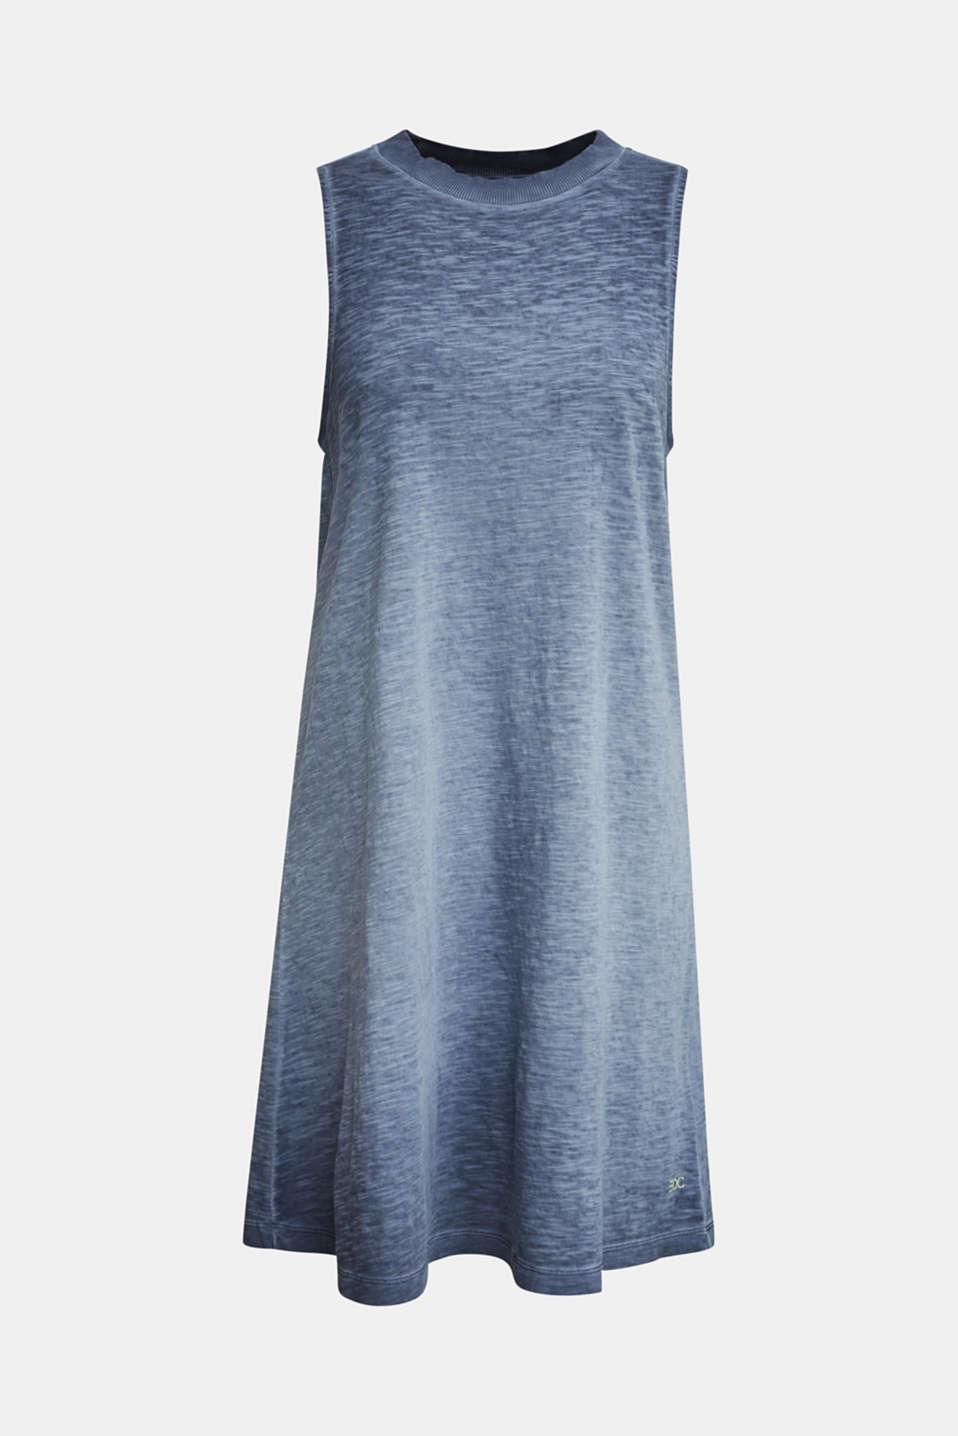 Cotton jersey dress, NAVY, detail image number 4